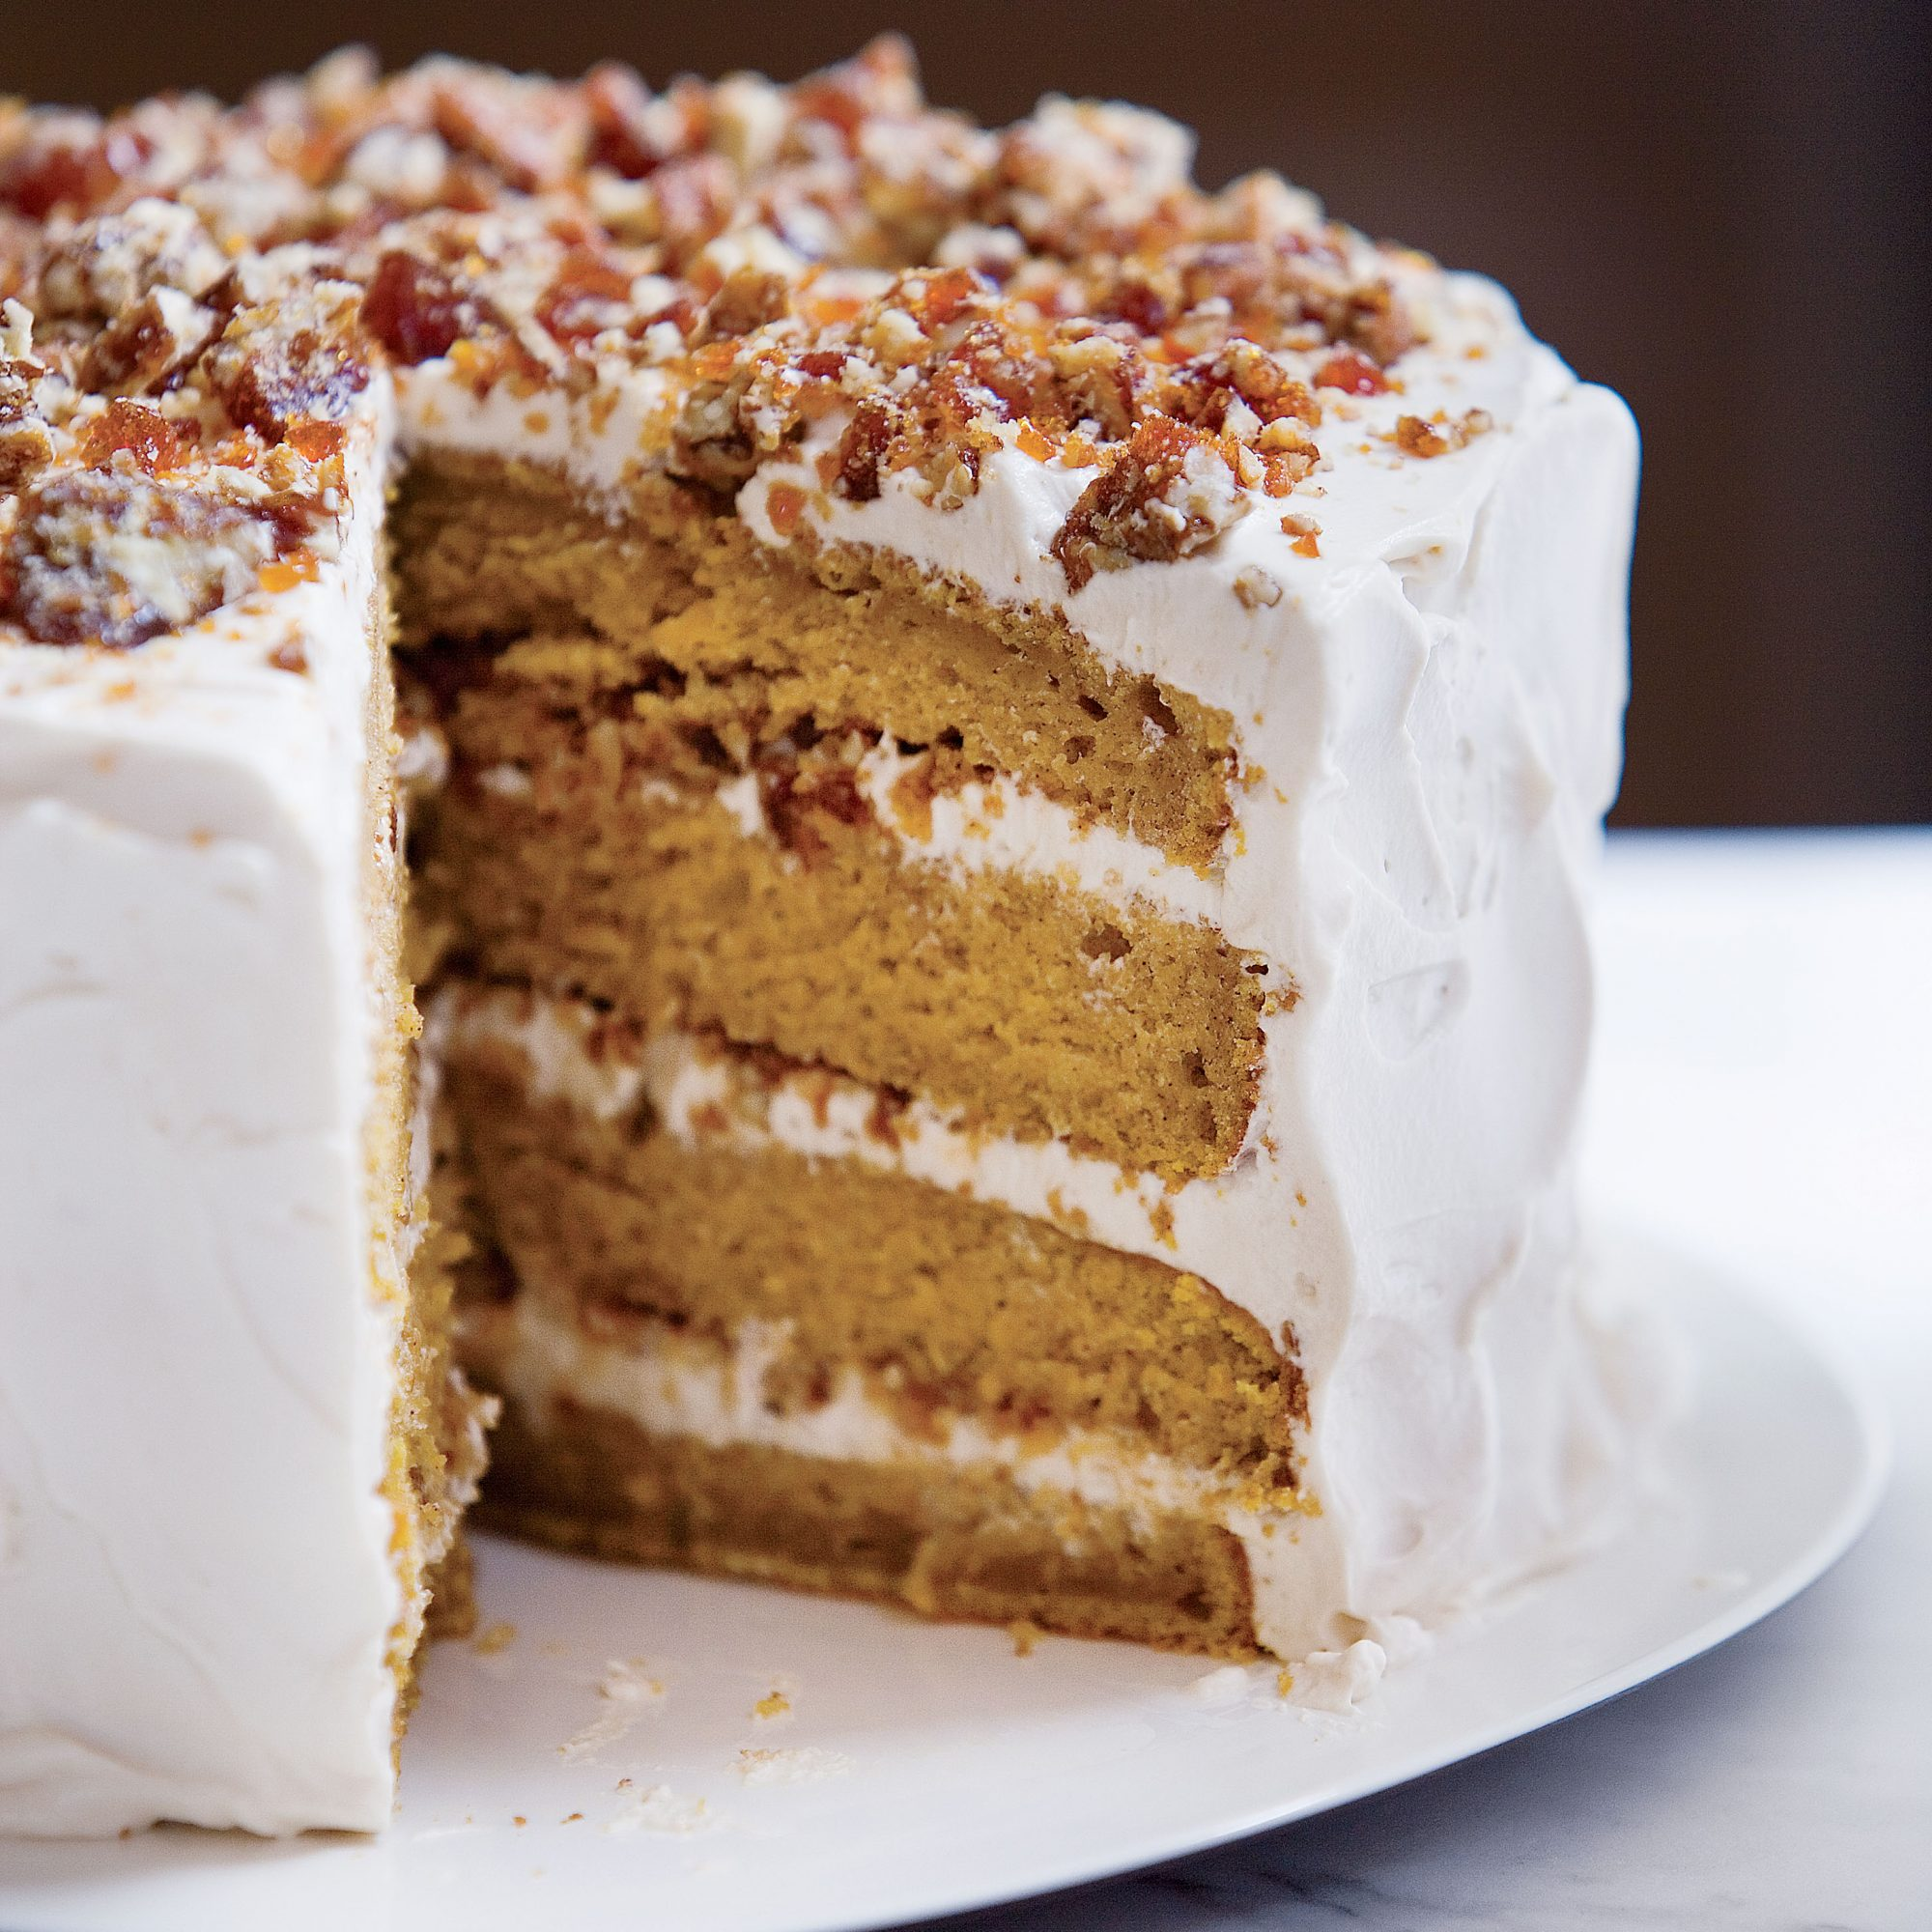 pumpkin cake with whipped cream and pecan praline